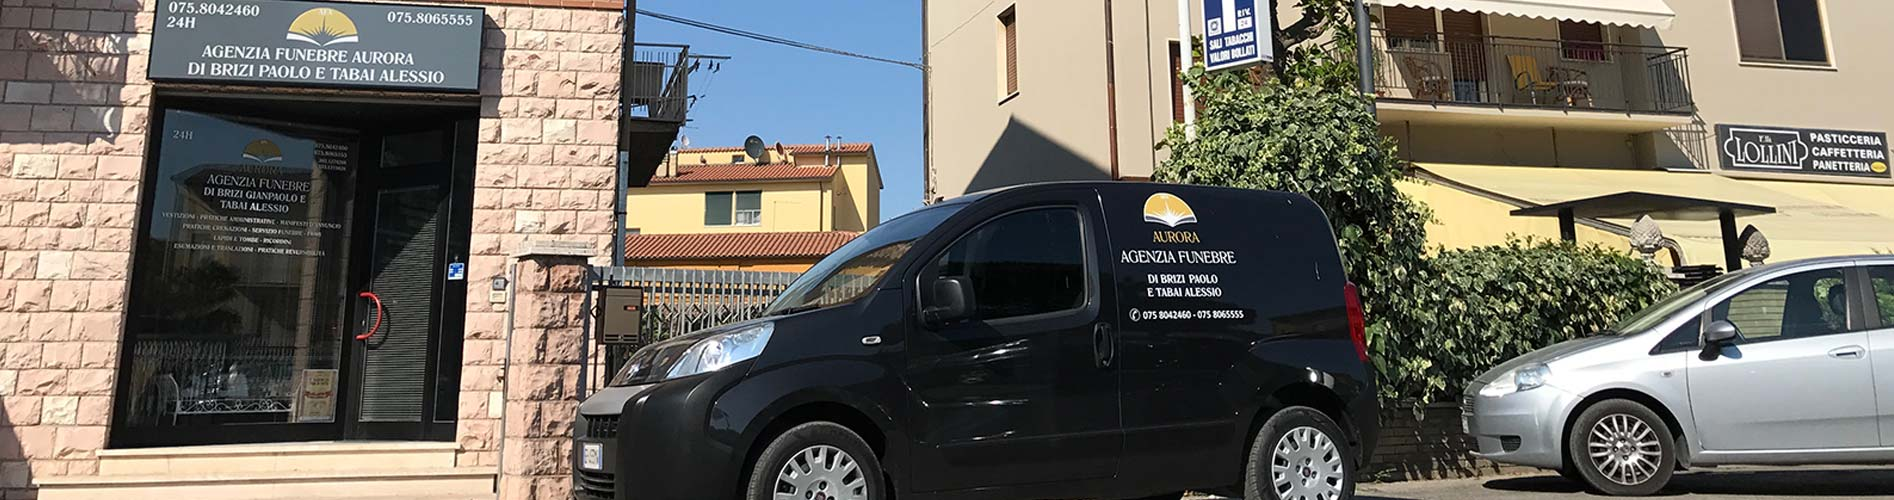 Agenzia Funebre Aurora - Santa Maria degli Angeli - Assisi